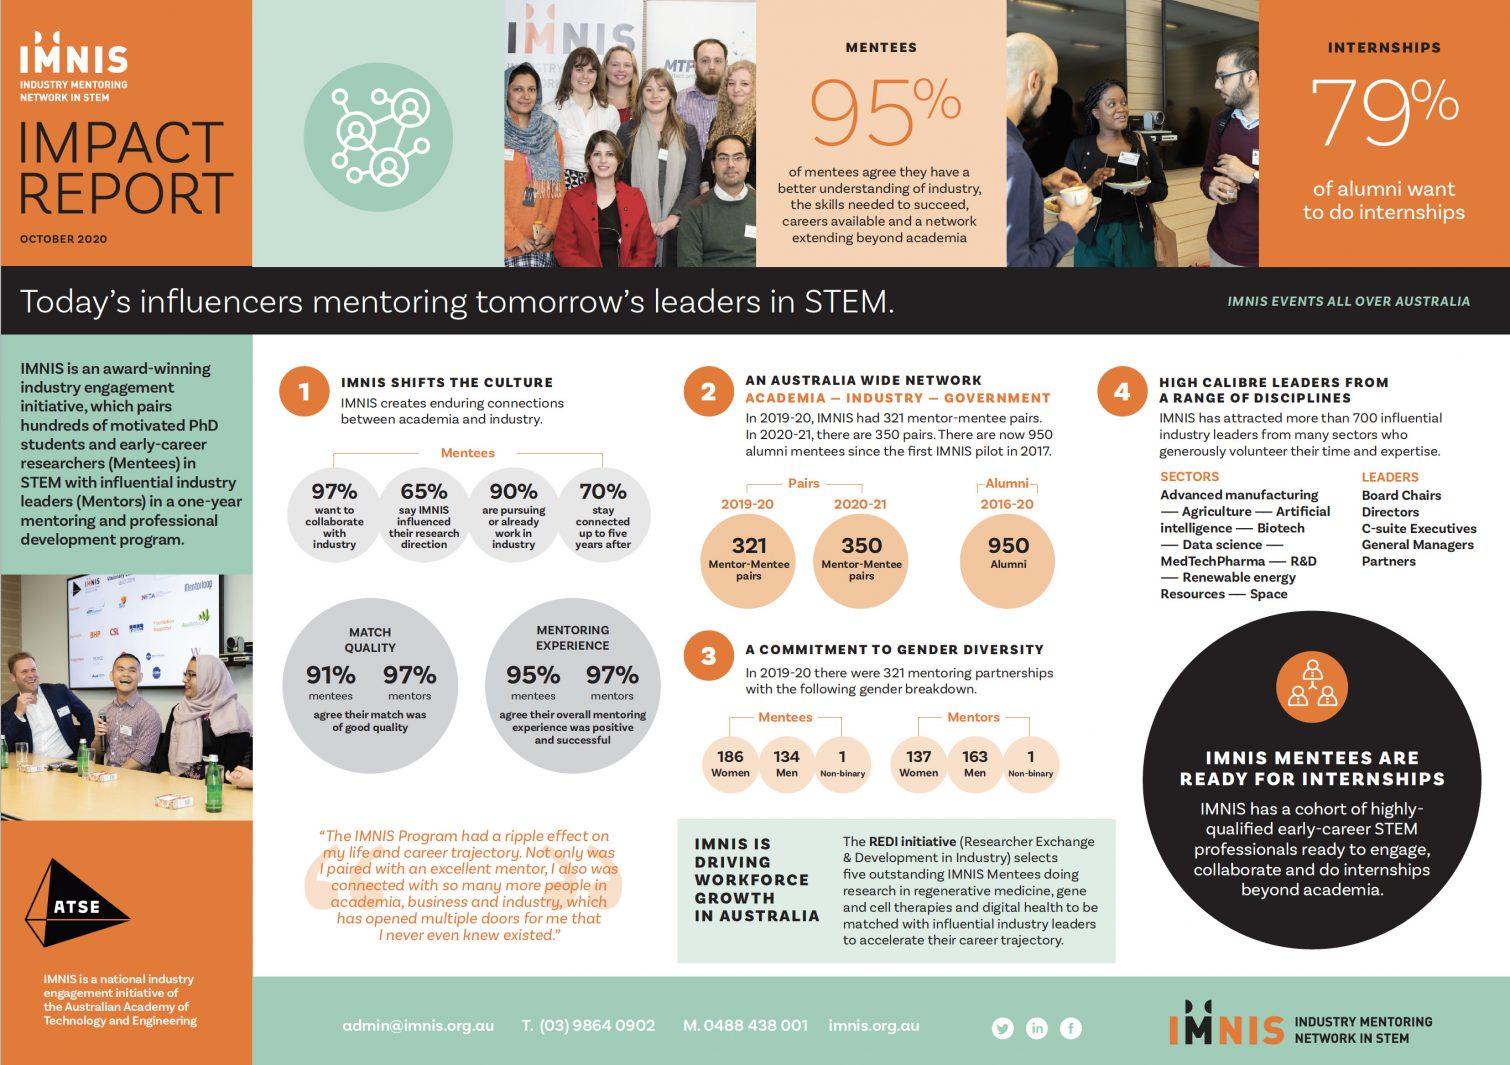 IMNIS impact report